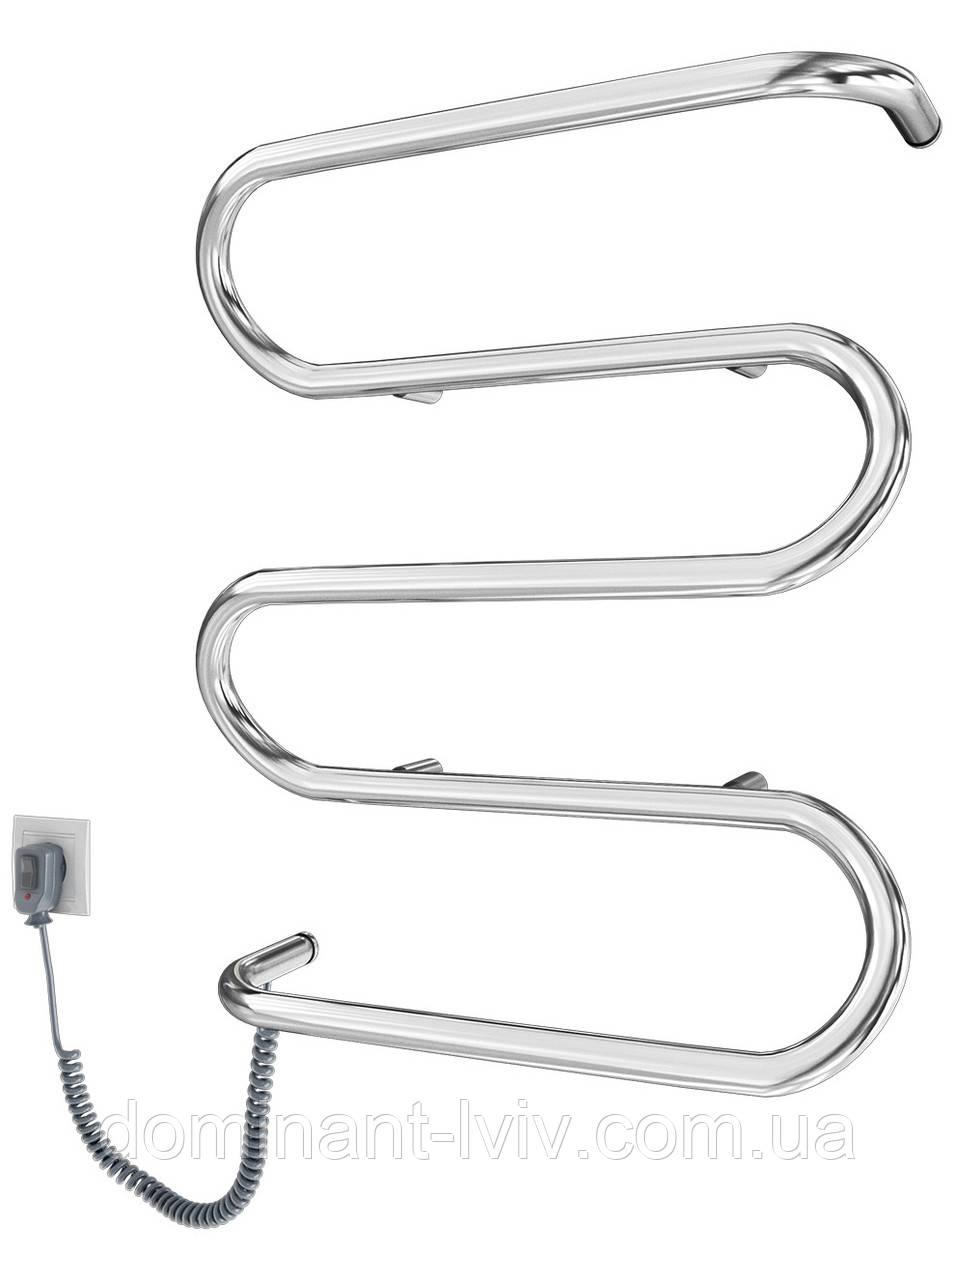 Электрический полотенцесушитель Mario Лиана-I 600x500, електрична рушникосушка